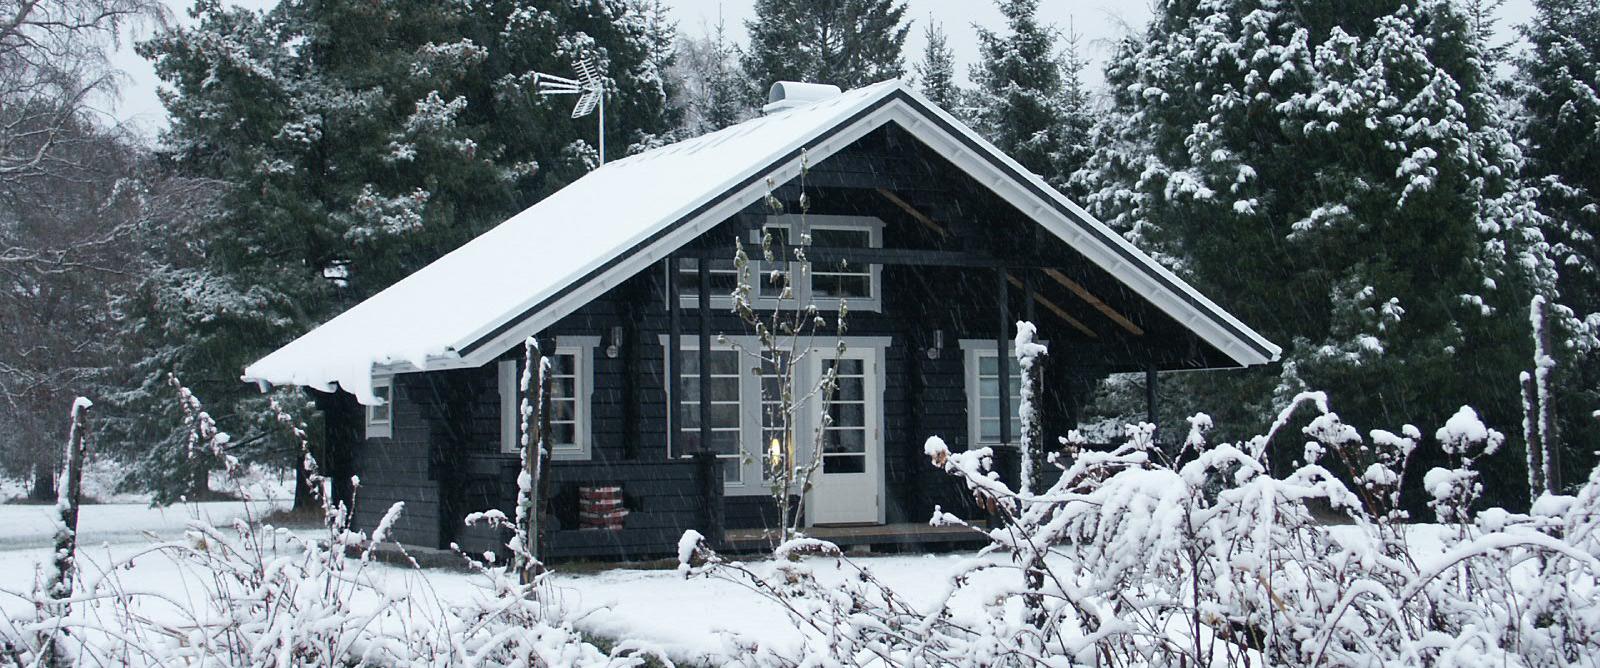 Björkbacken stuga i vinterskrud.